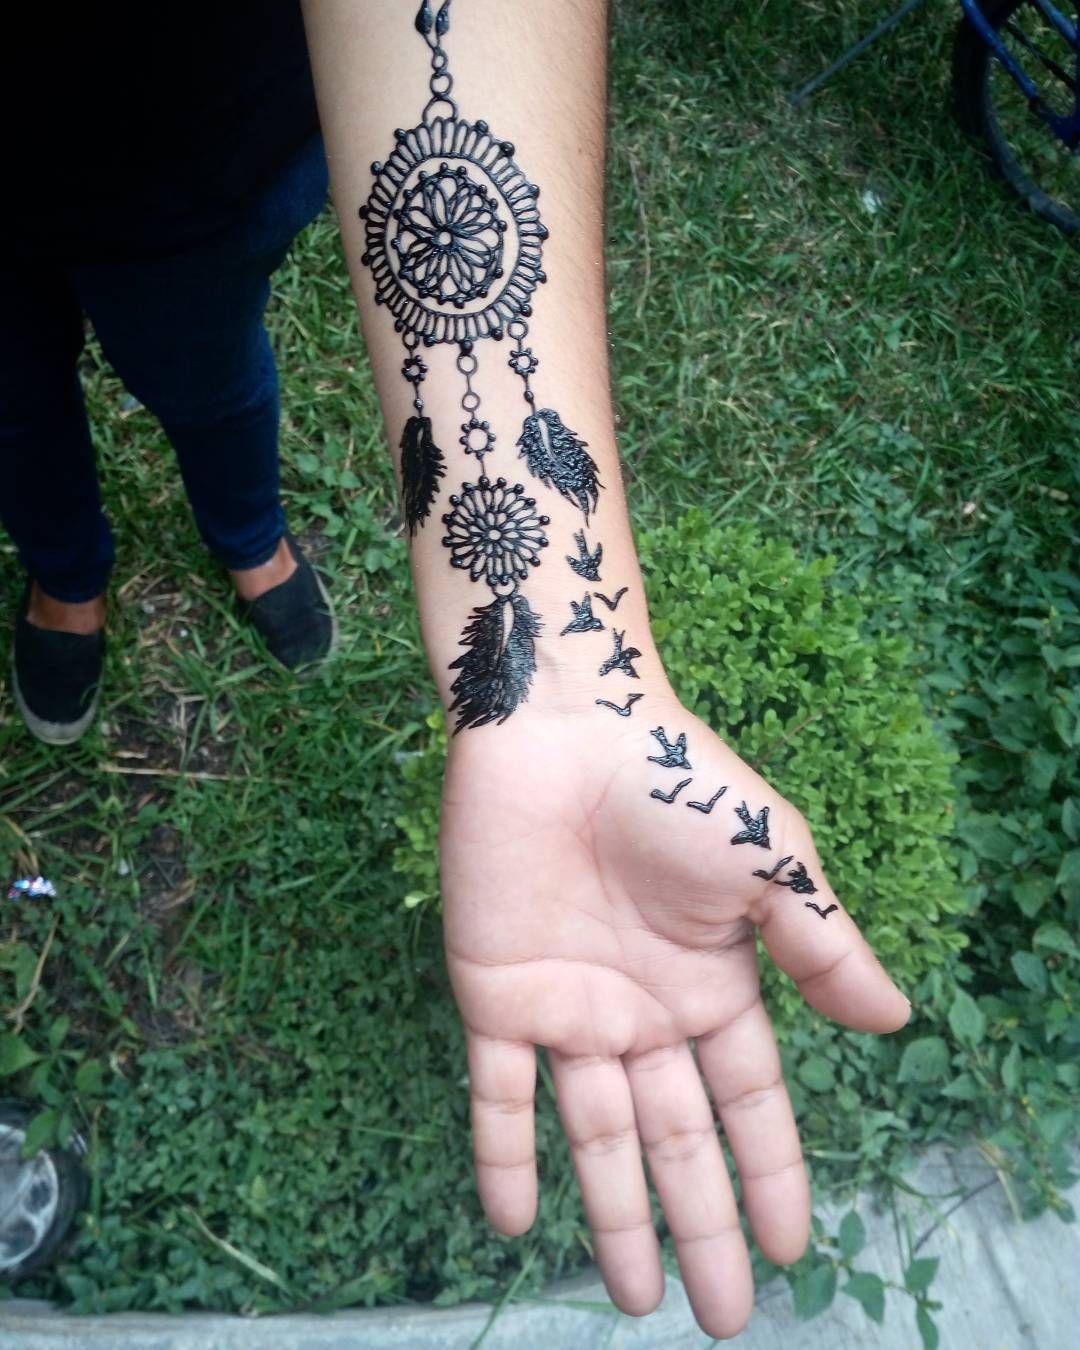 35 Imaginative Dream Catcher Tattoo Designs Page 17 of